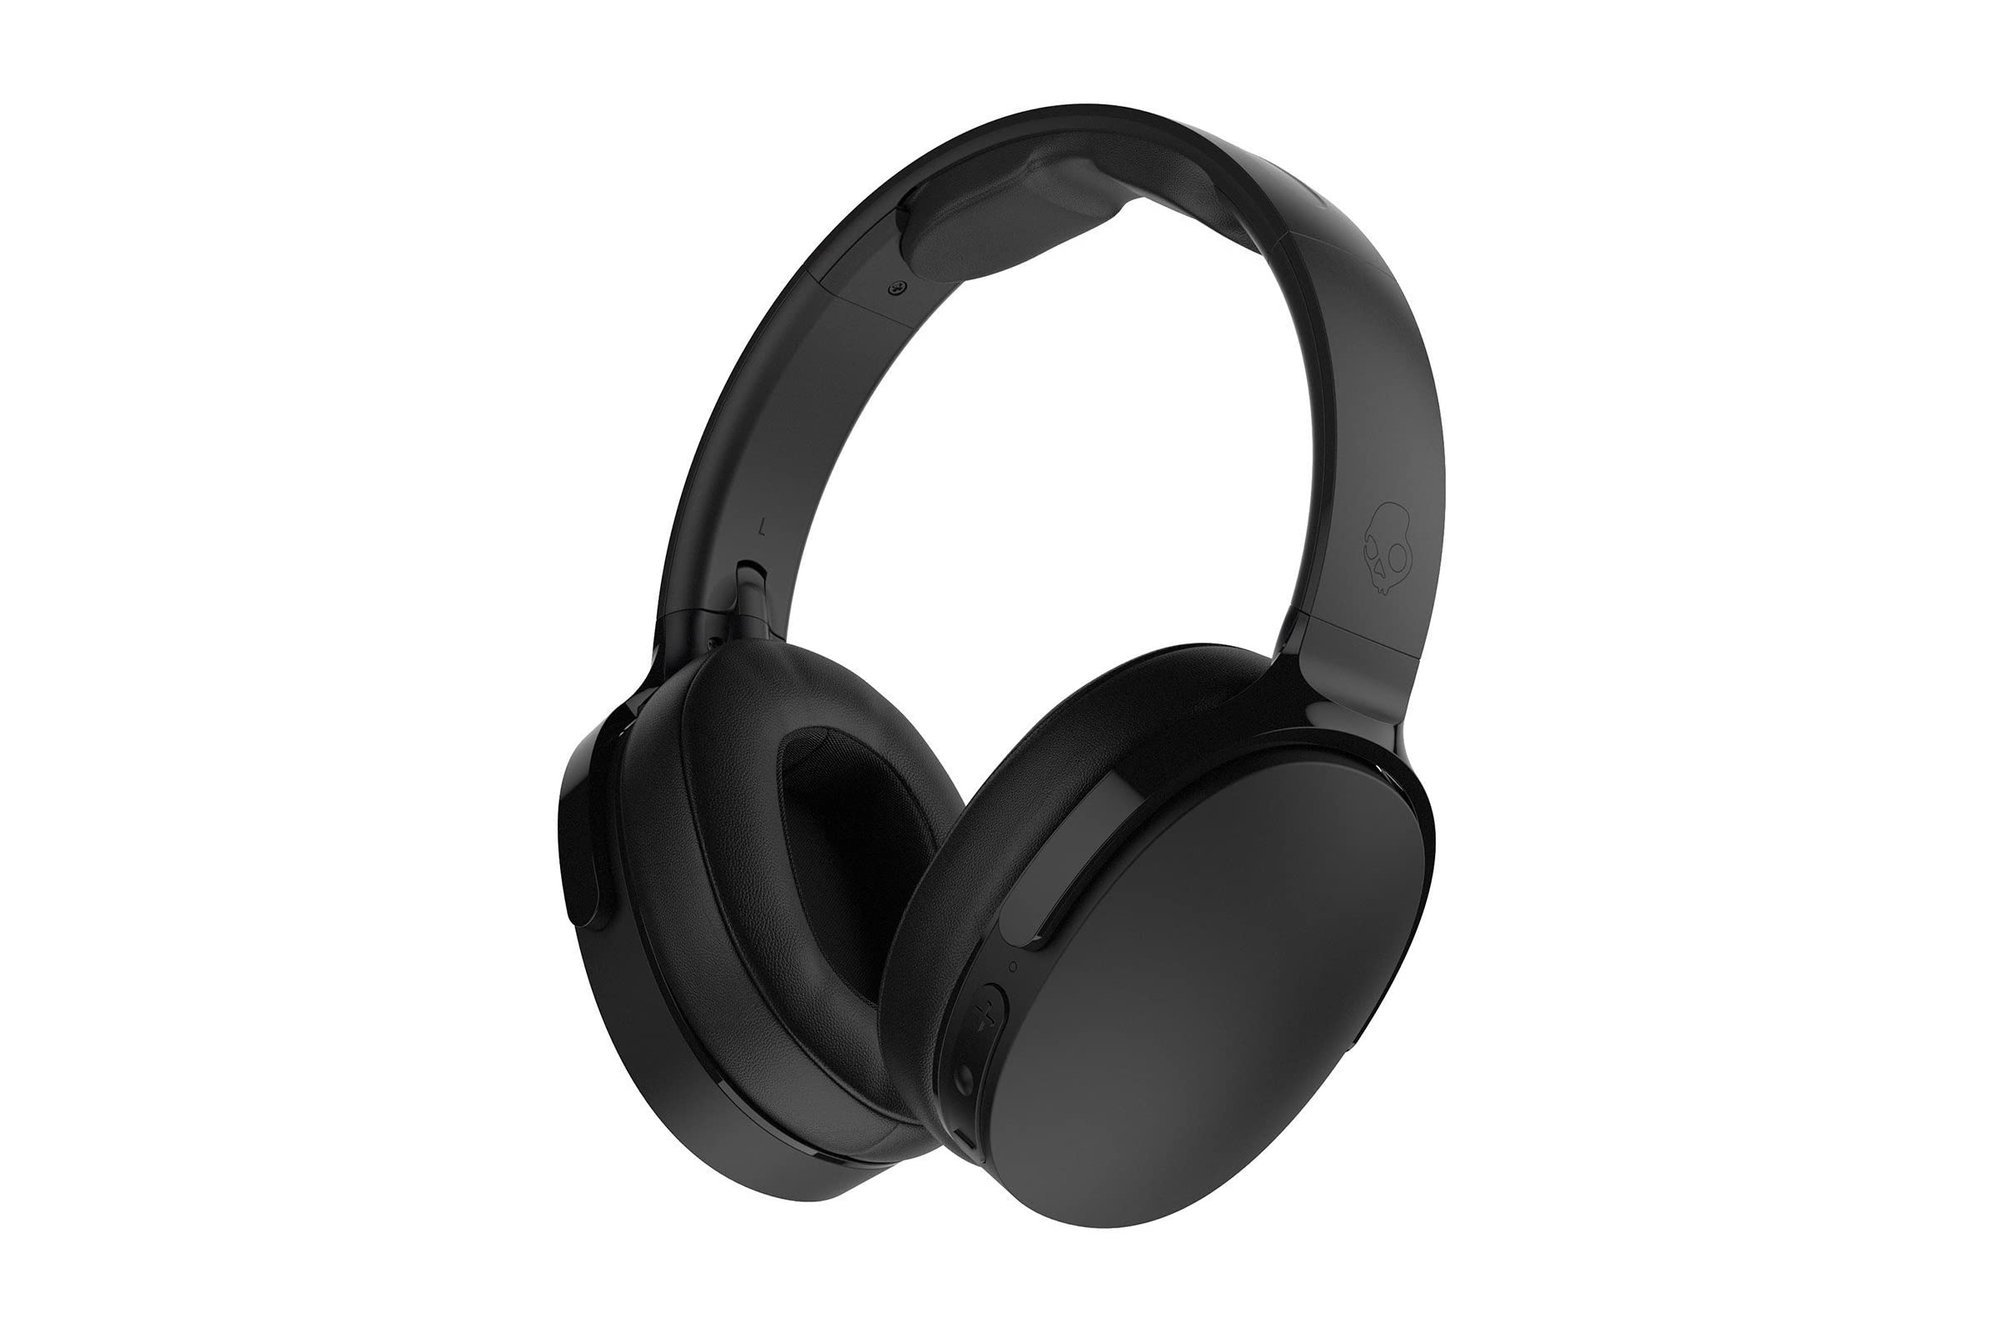 Skullcandy Hesh 3 S6HTW Over-the-Ear Headphones Black